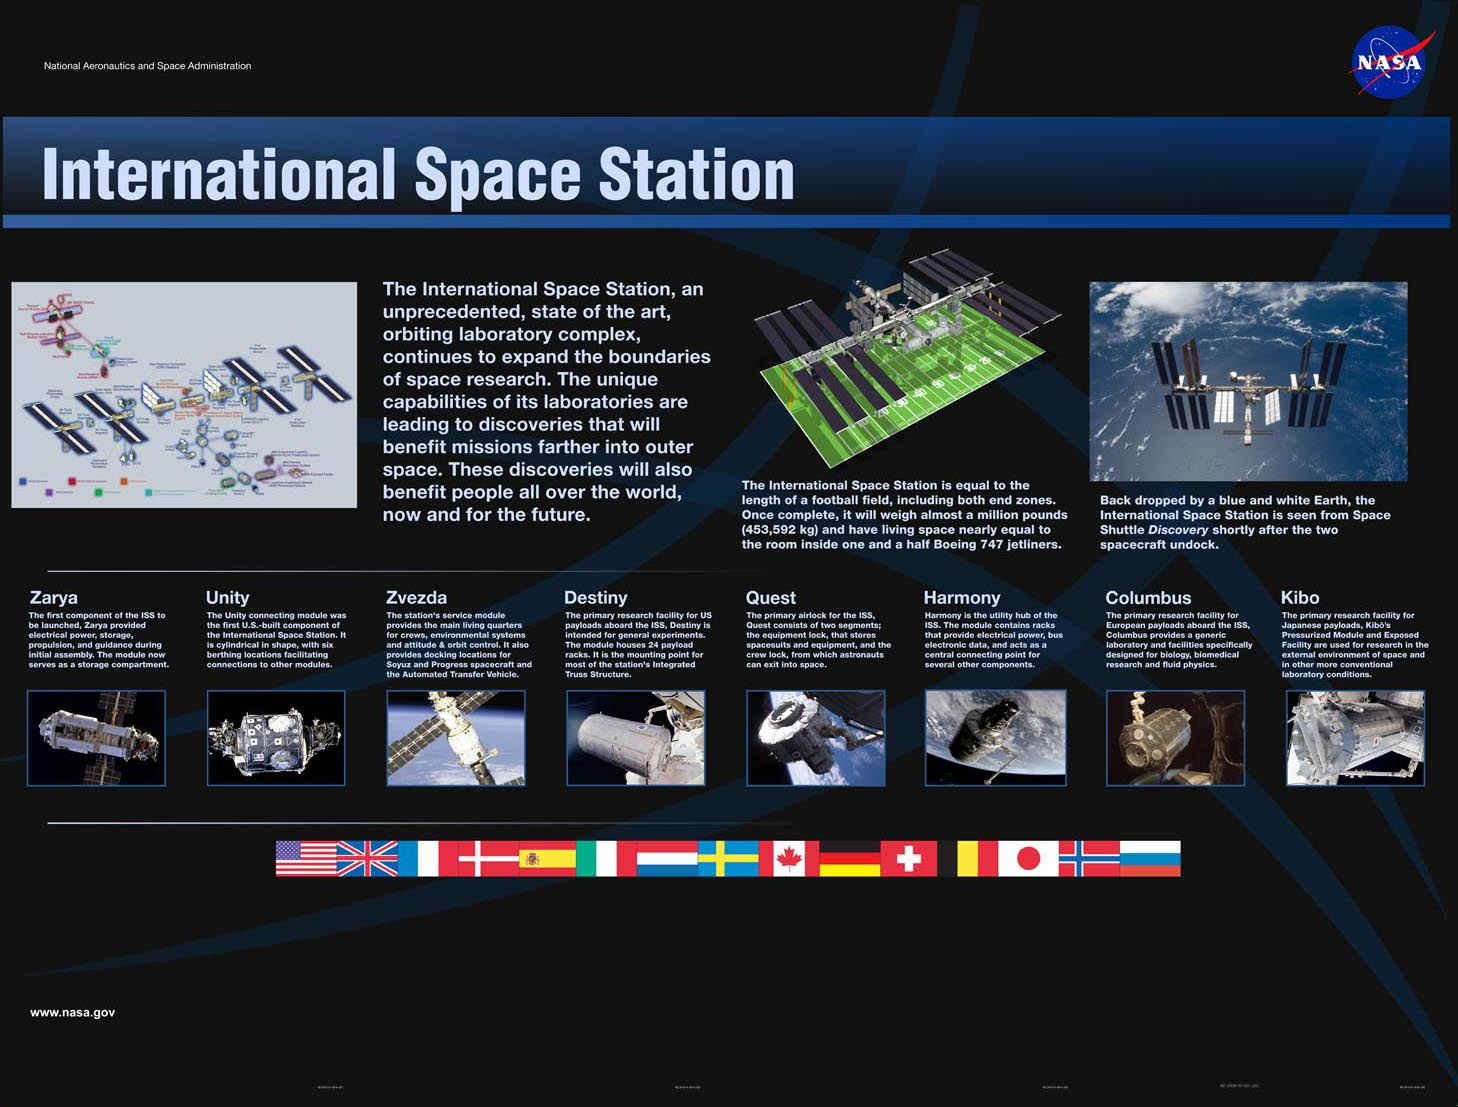 nasa international space station information - photo #29